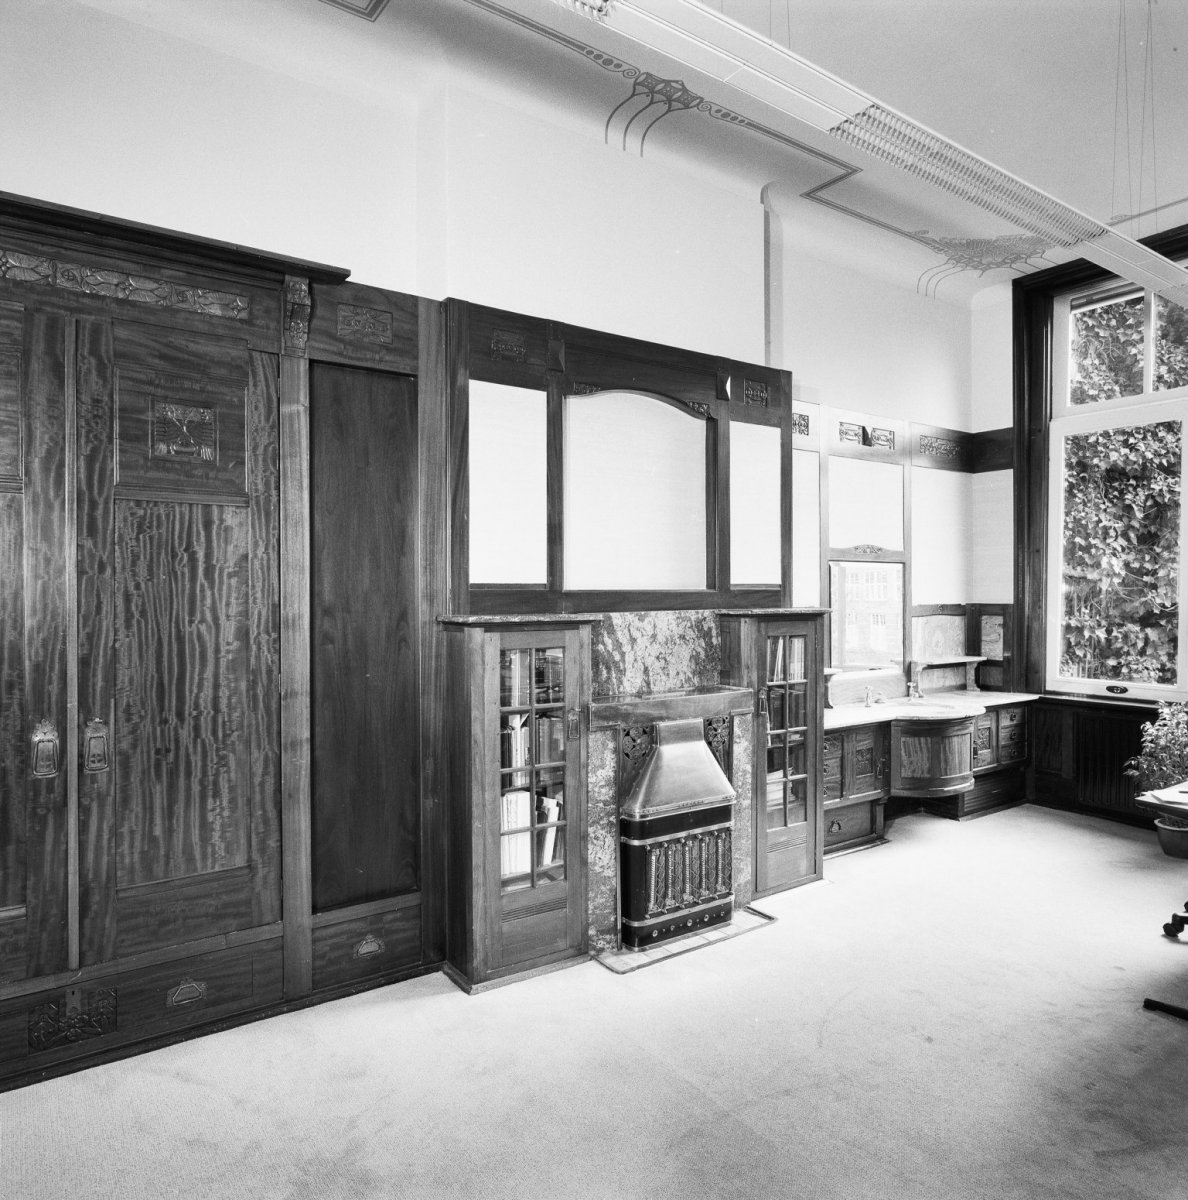 file interieur bovenverdieping kachel wandbetimmering art deco amsterdam 20298486 rce. Black Bedroom Furniture Sets. Home Design Ideas